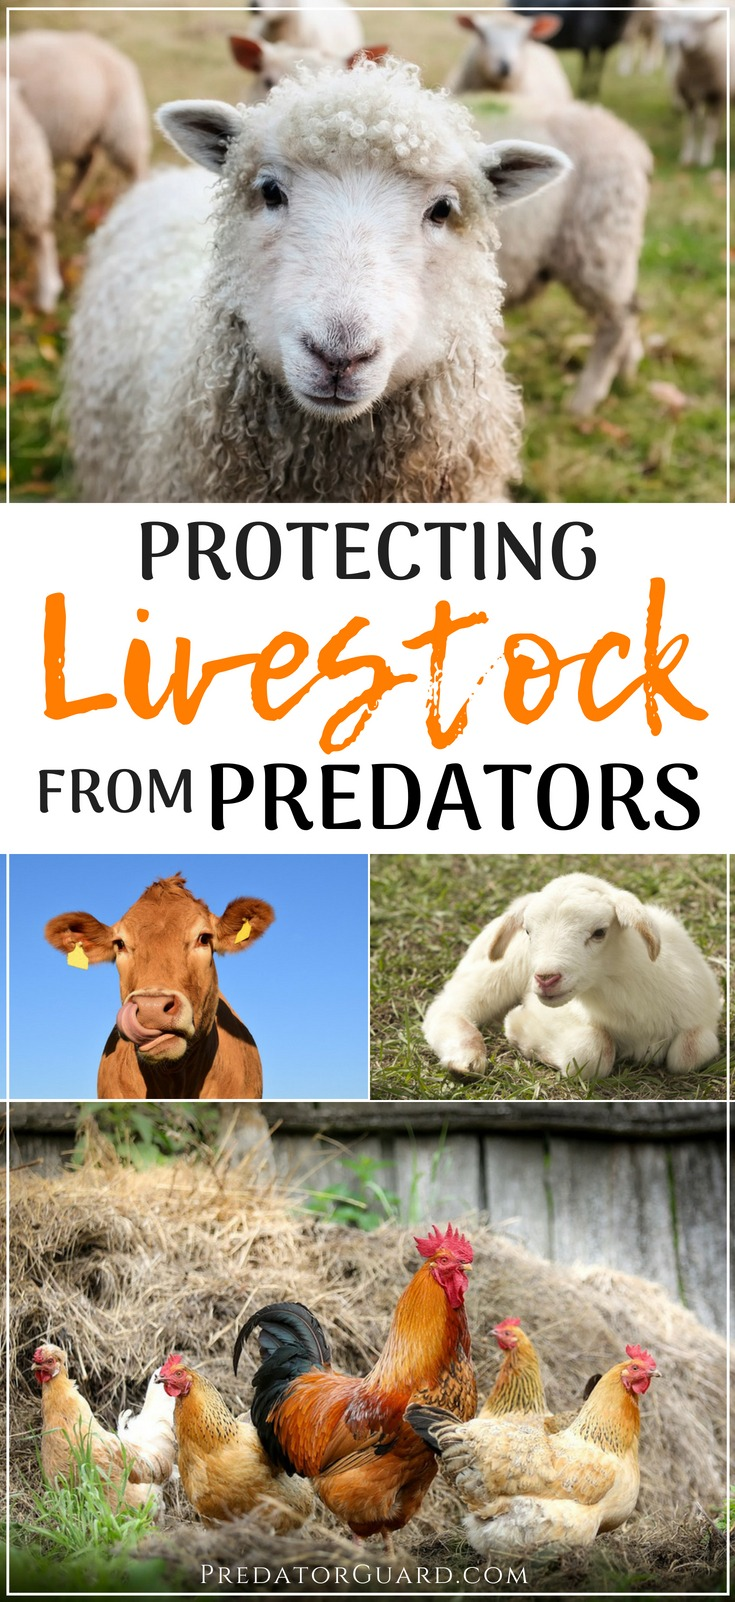 Protecting-Livestock-From-Predators